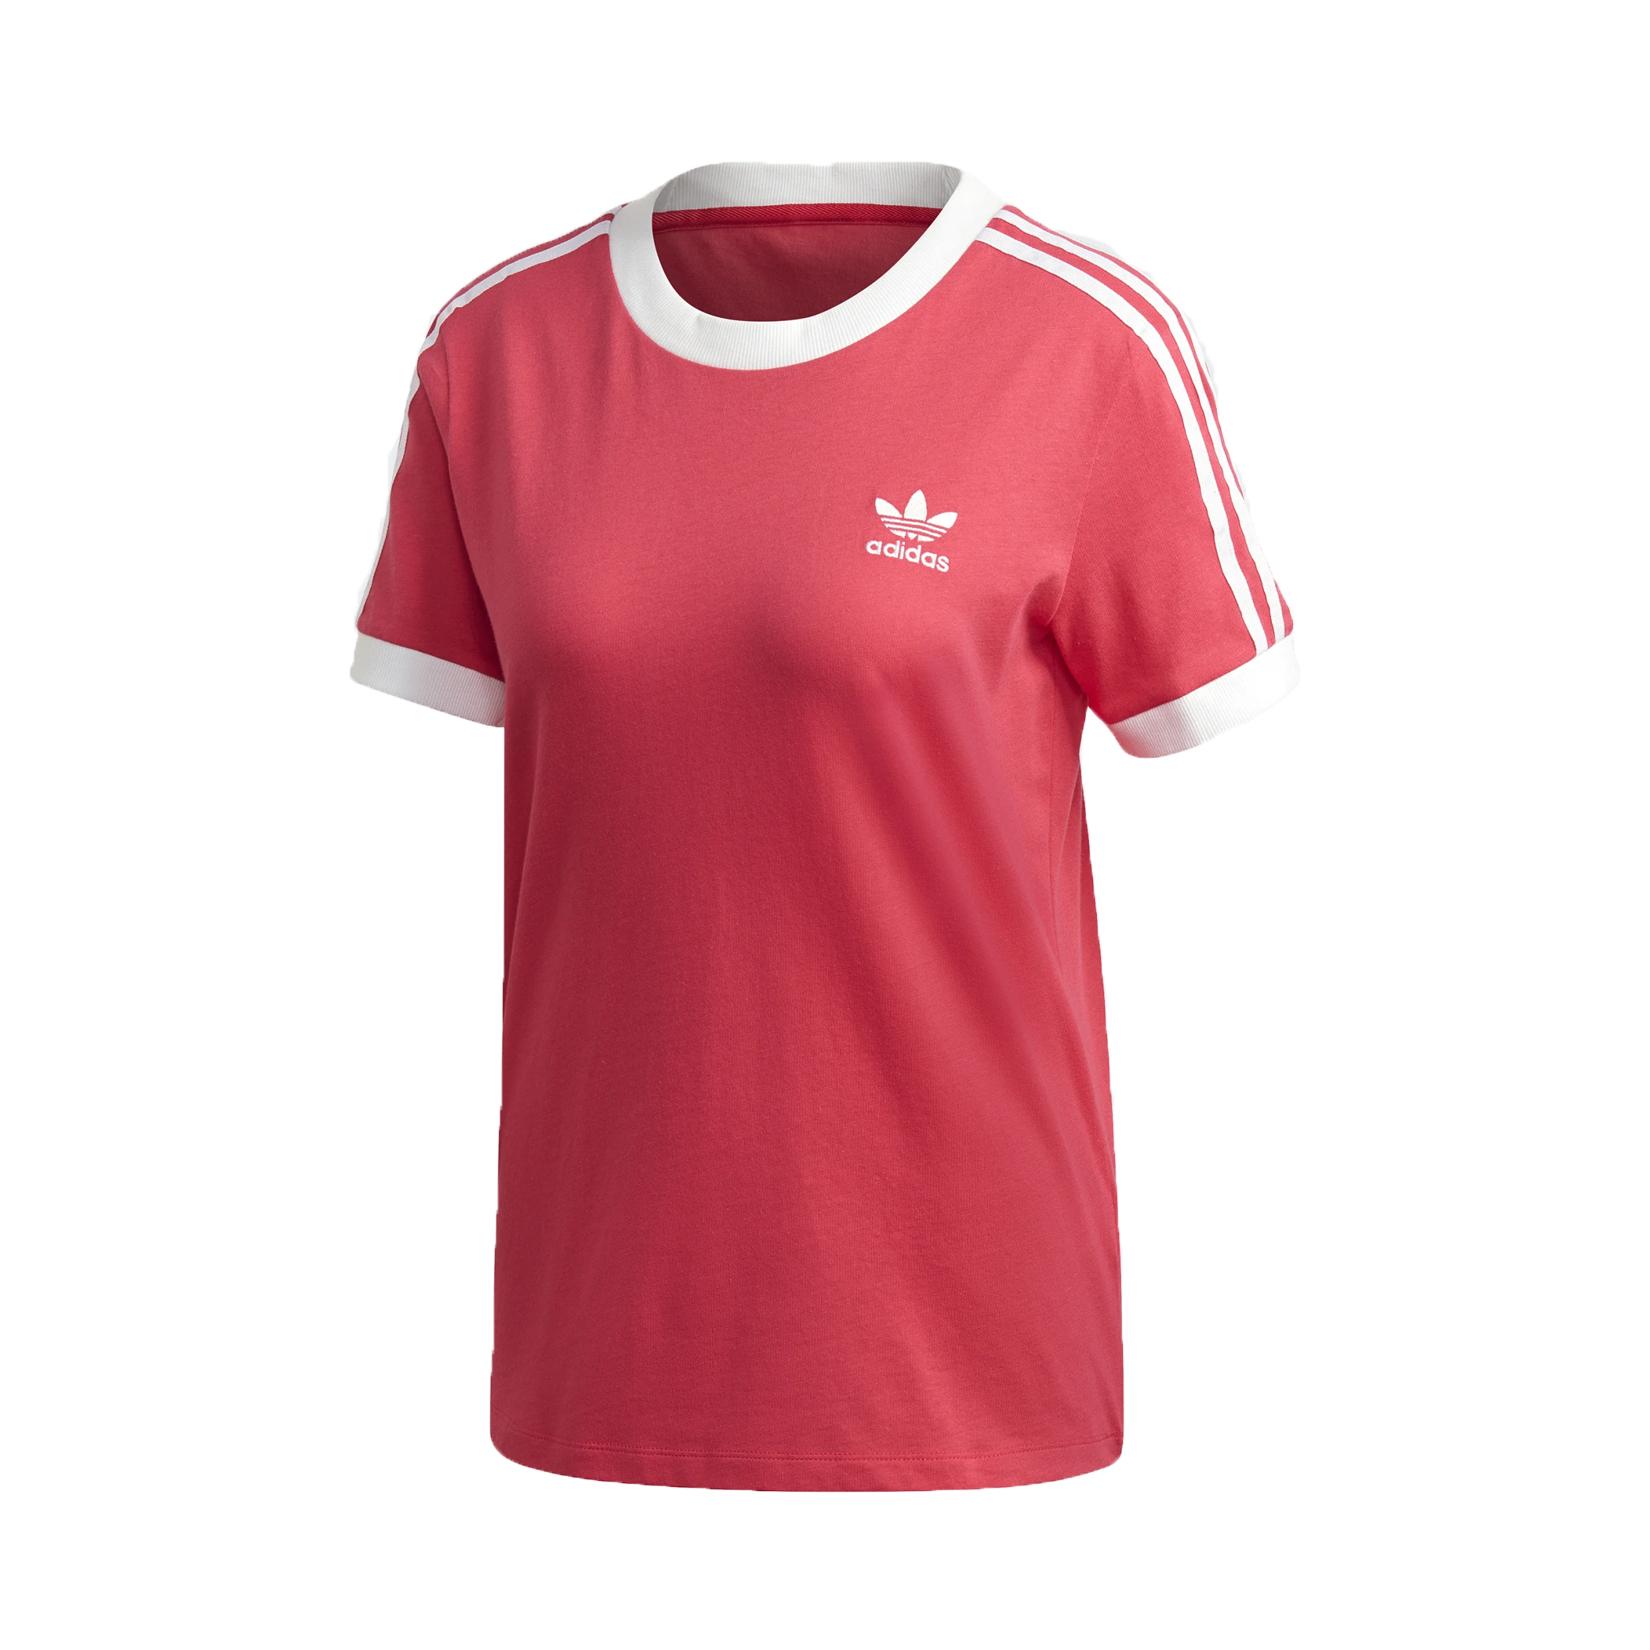 Adidas Originals 3-Stripes Tee T-Shirt Pink